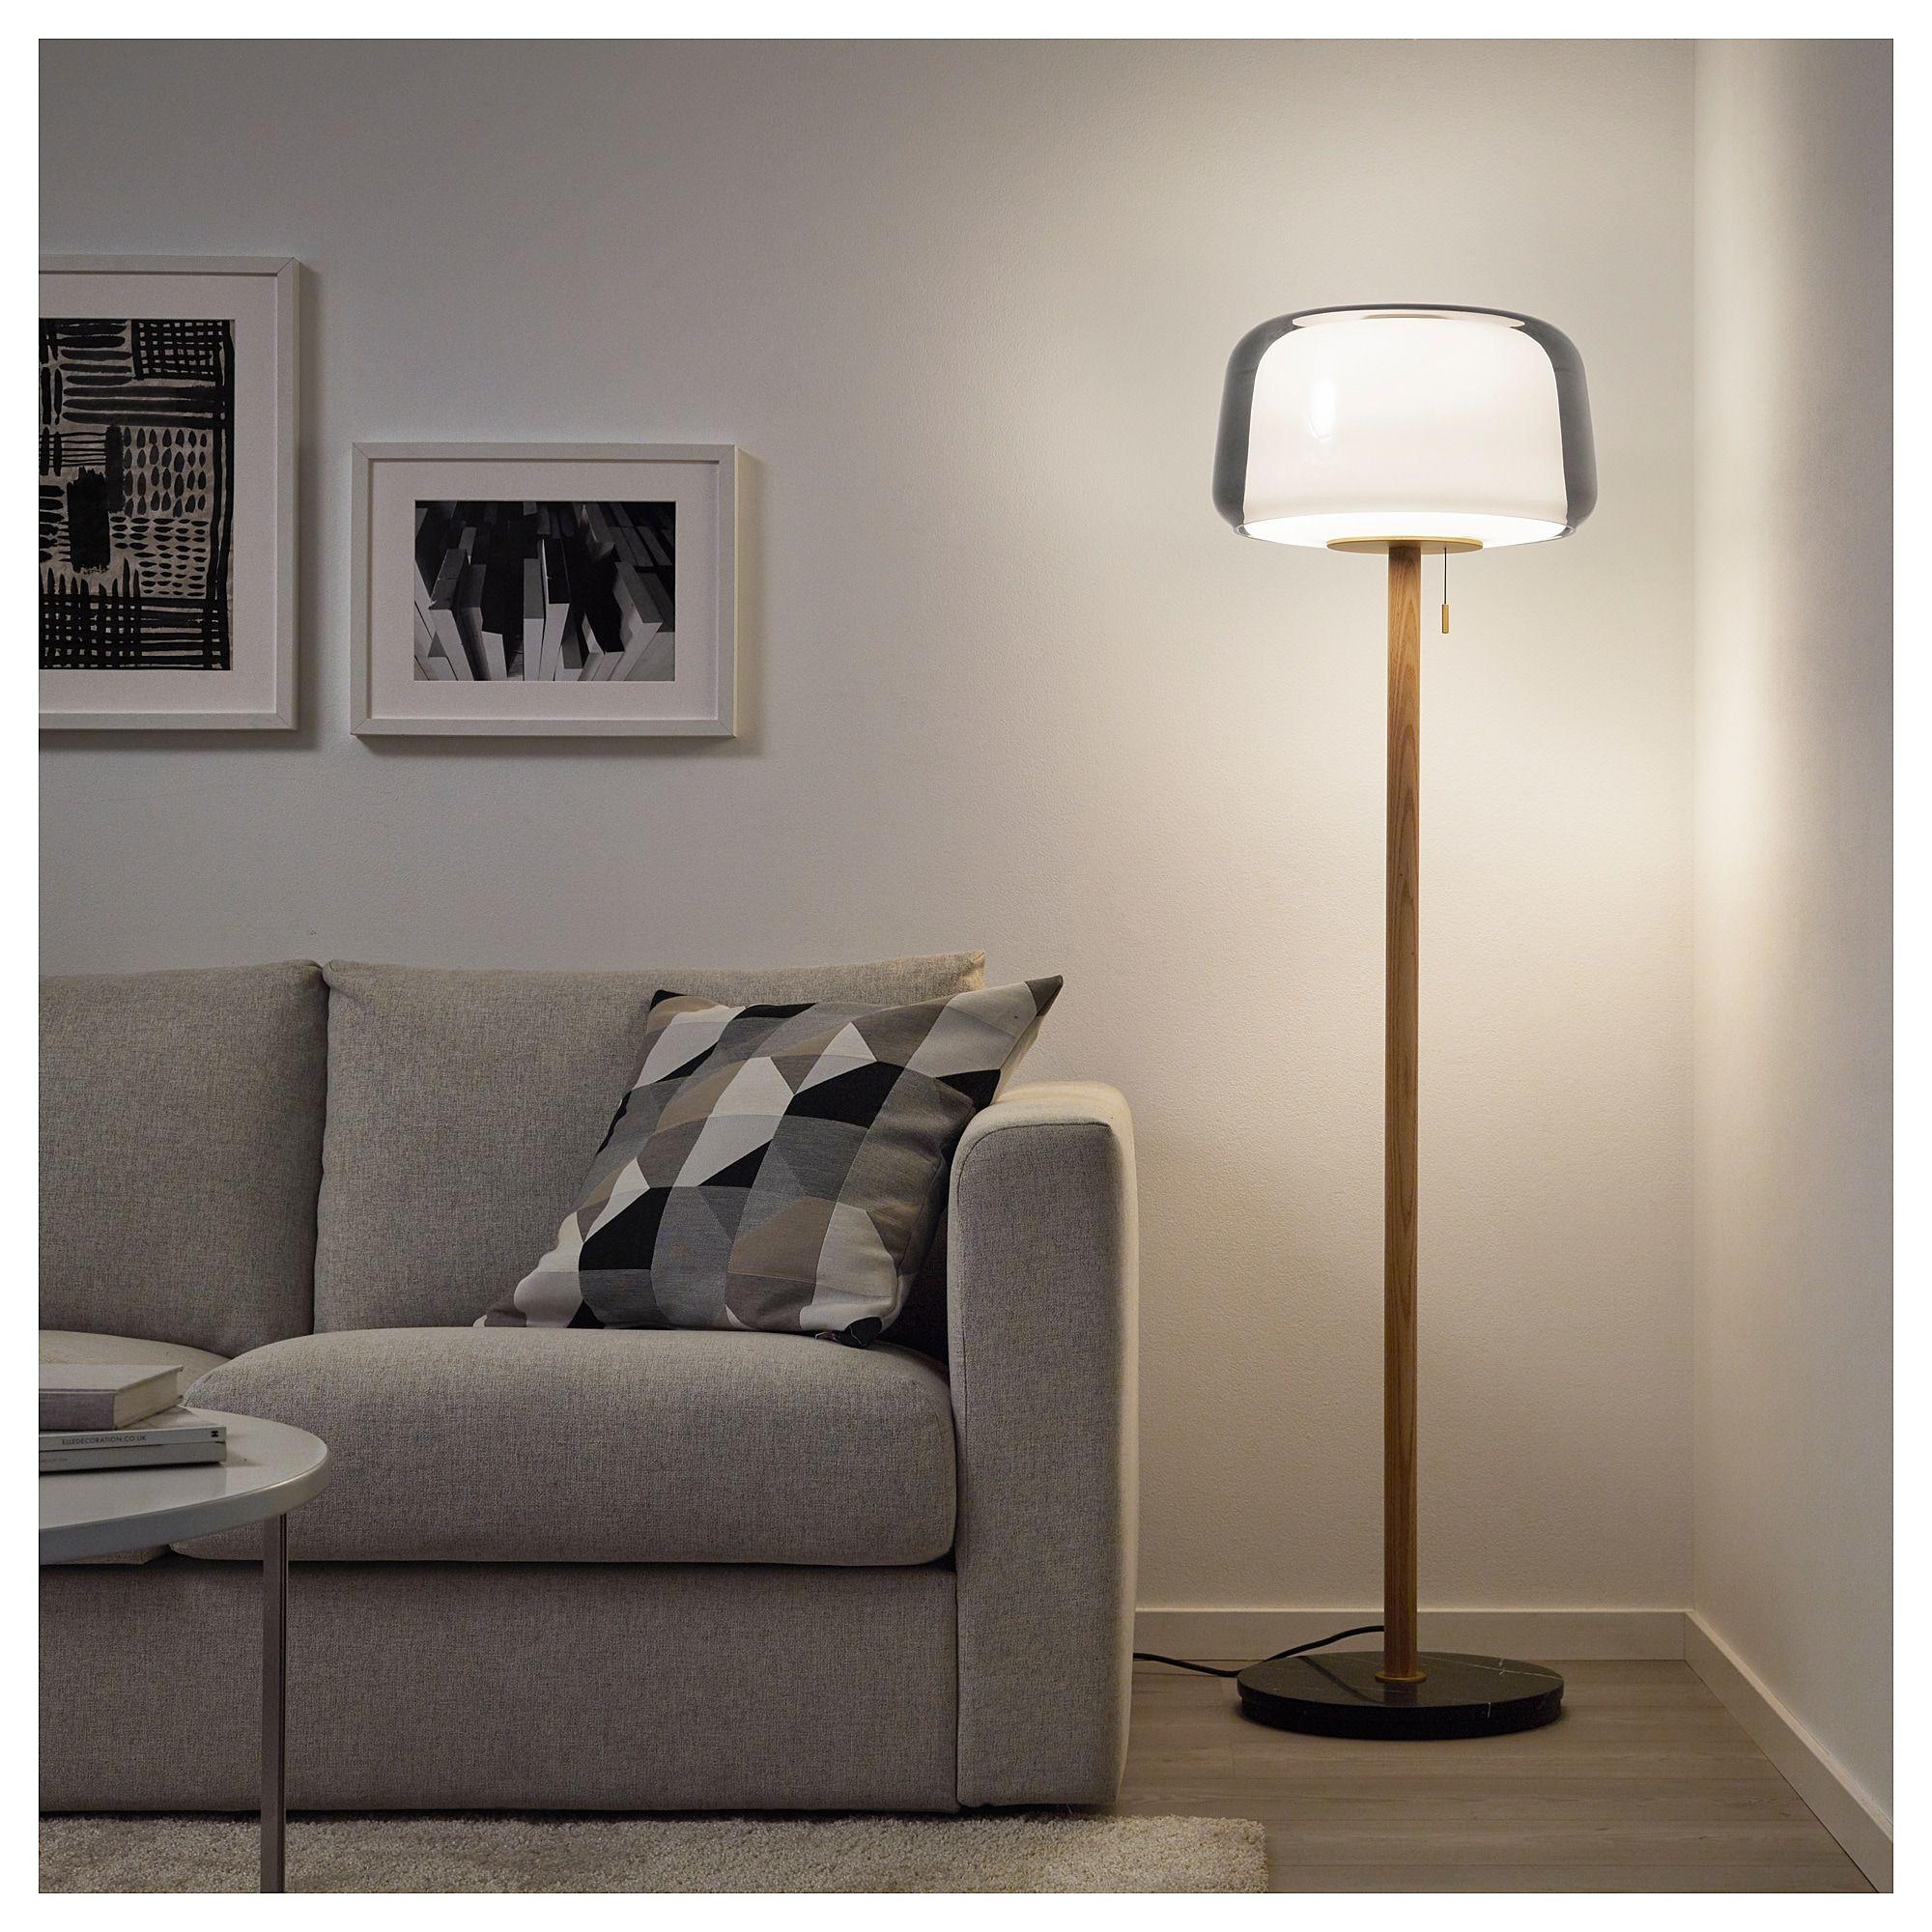 Evedal Lampadaire Marbre Gris Gris Ikea Floor Lamp Grey Floor Lamp Lamps Living Room